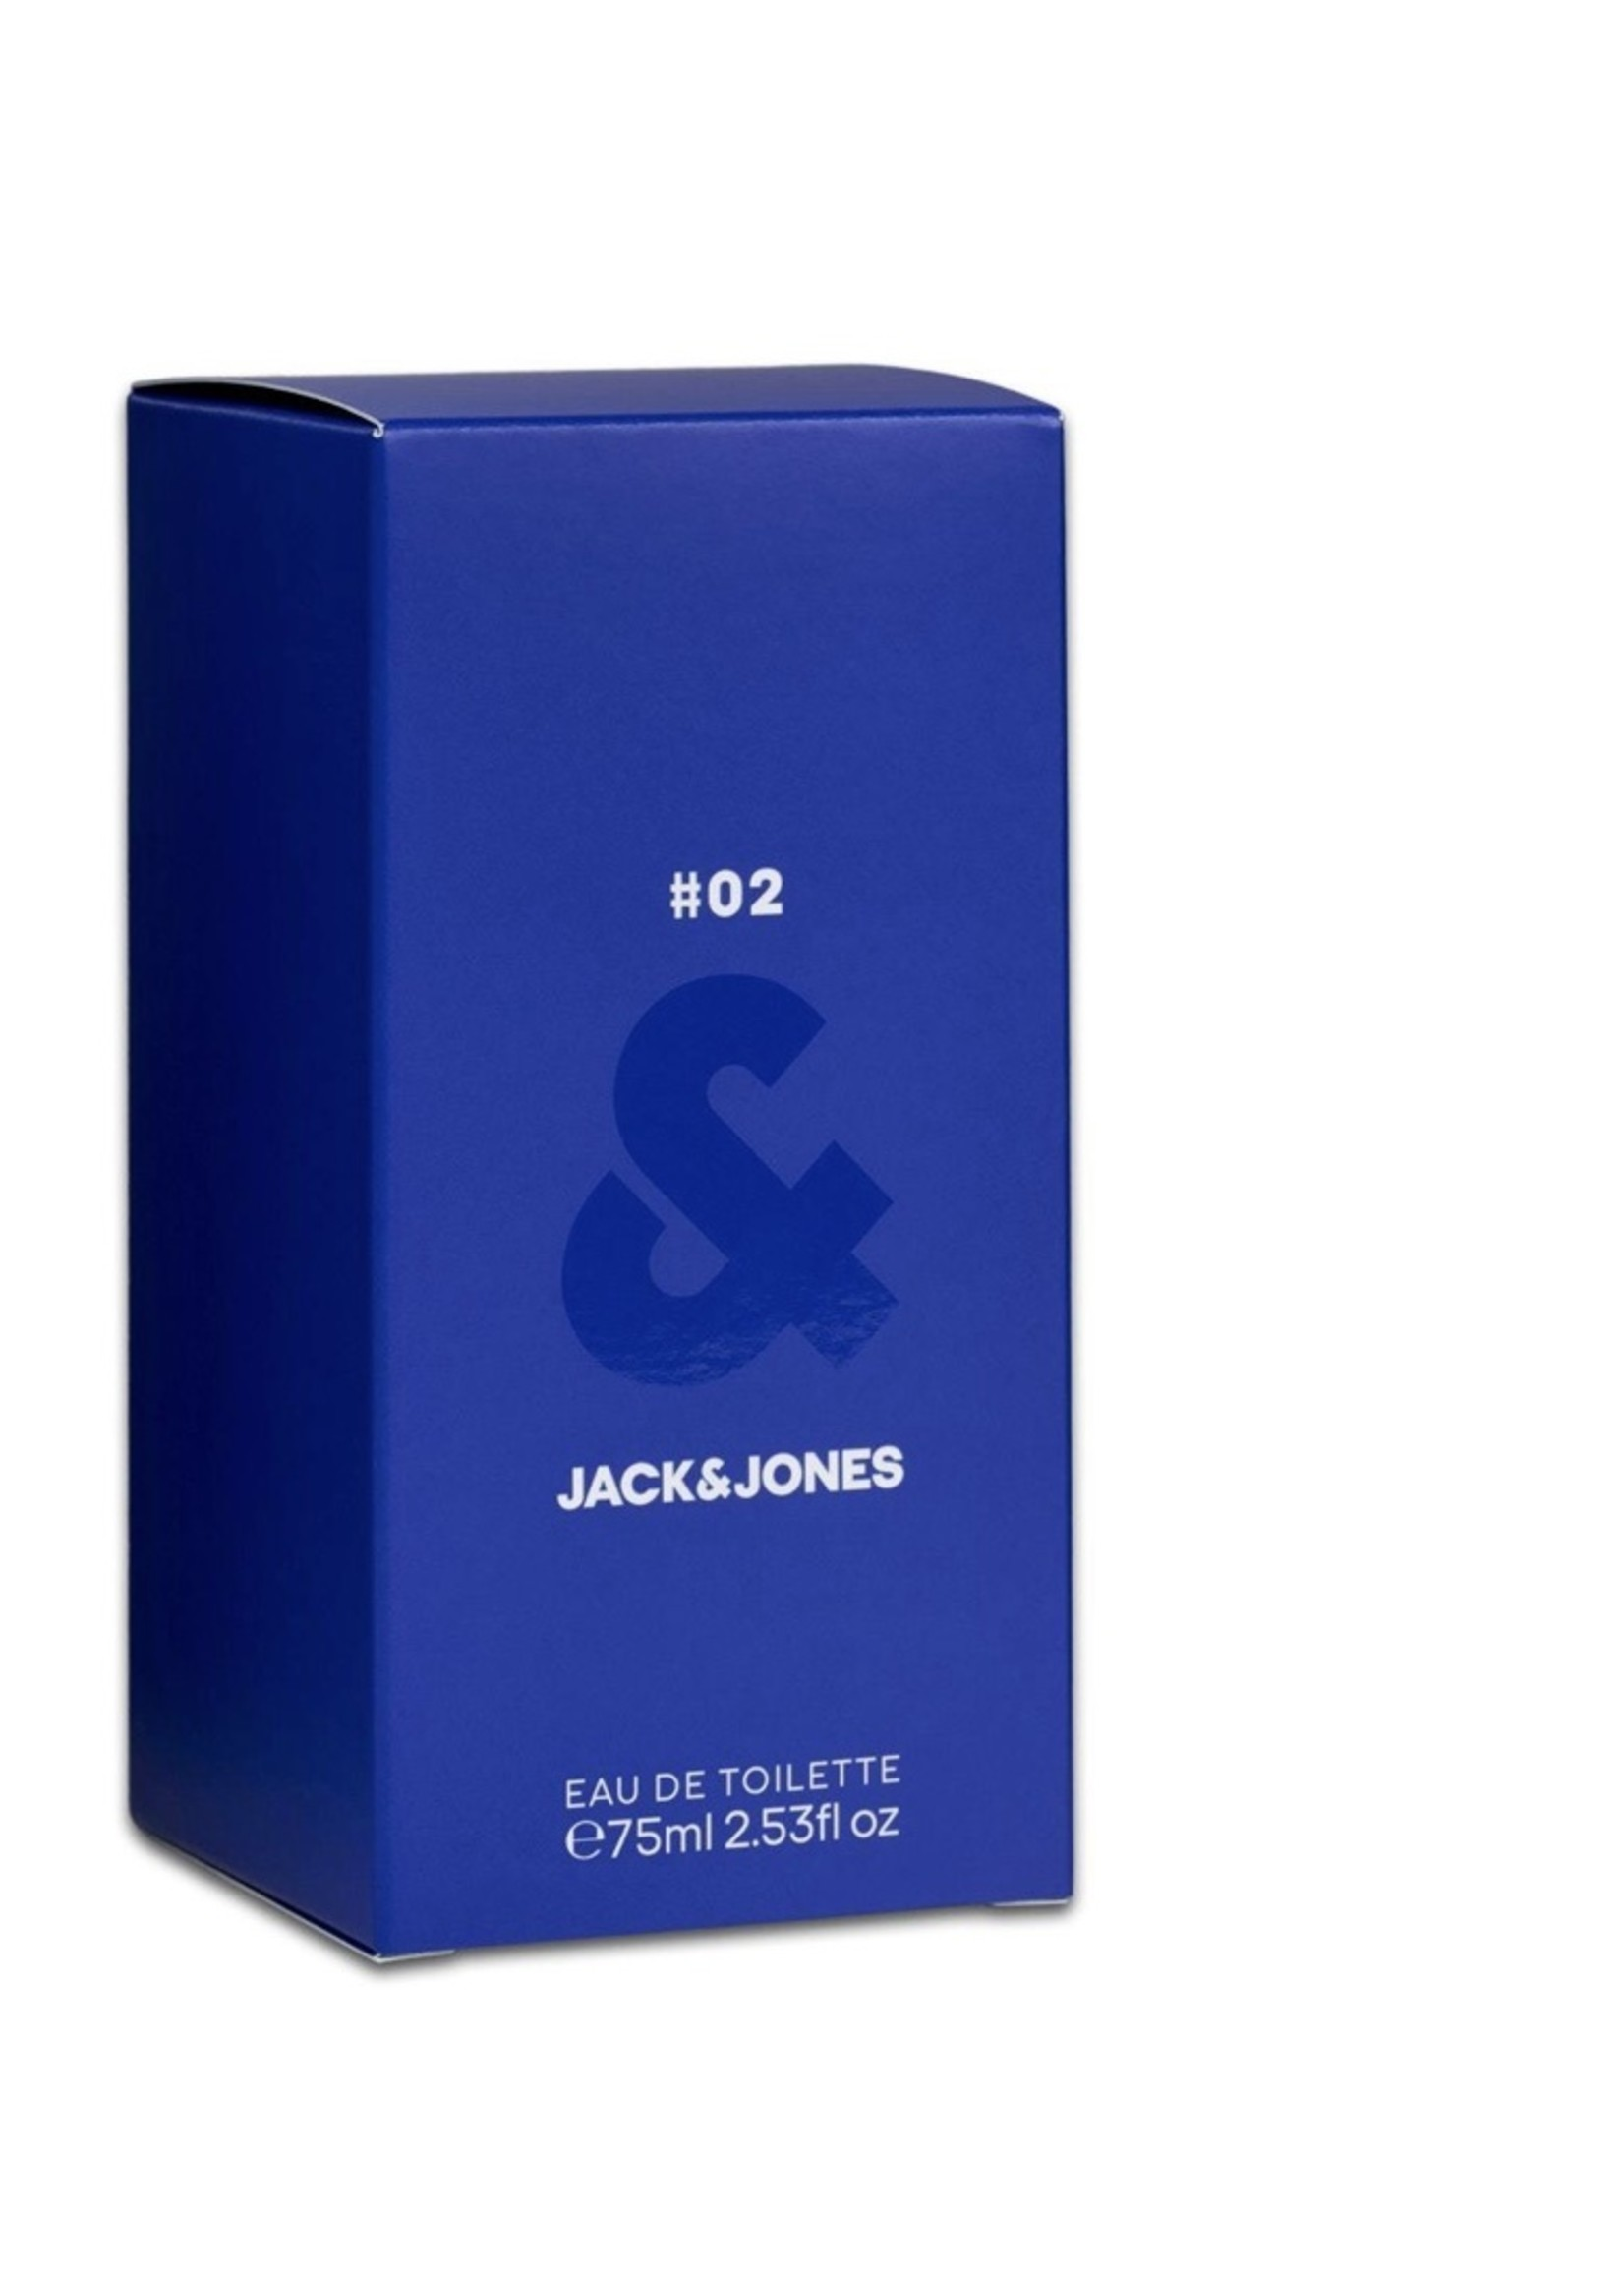 JACK & JONES #02 Eau De Toilette 75mL